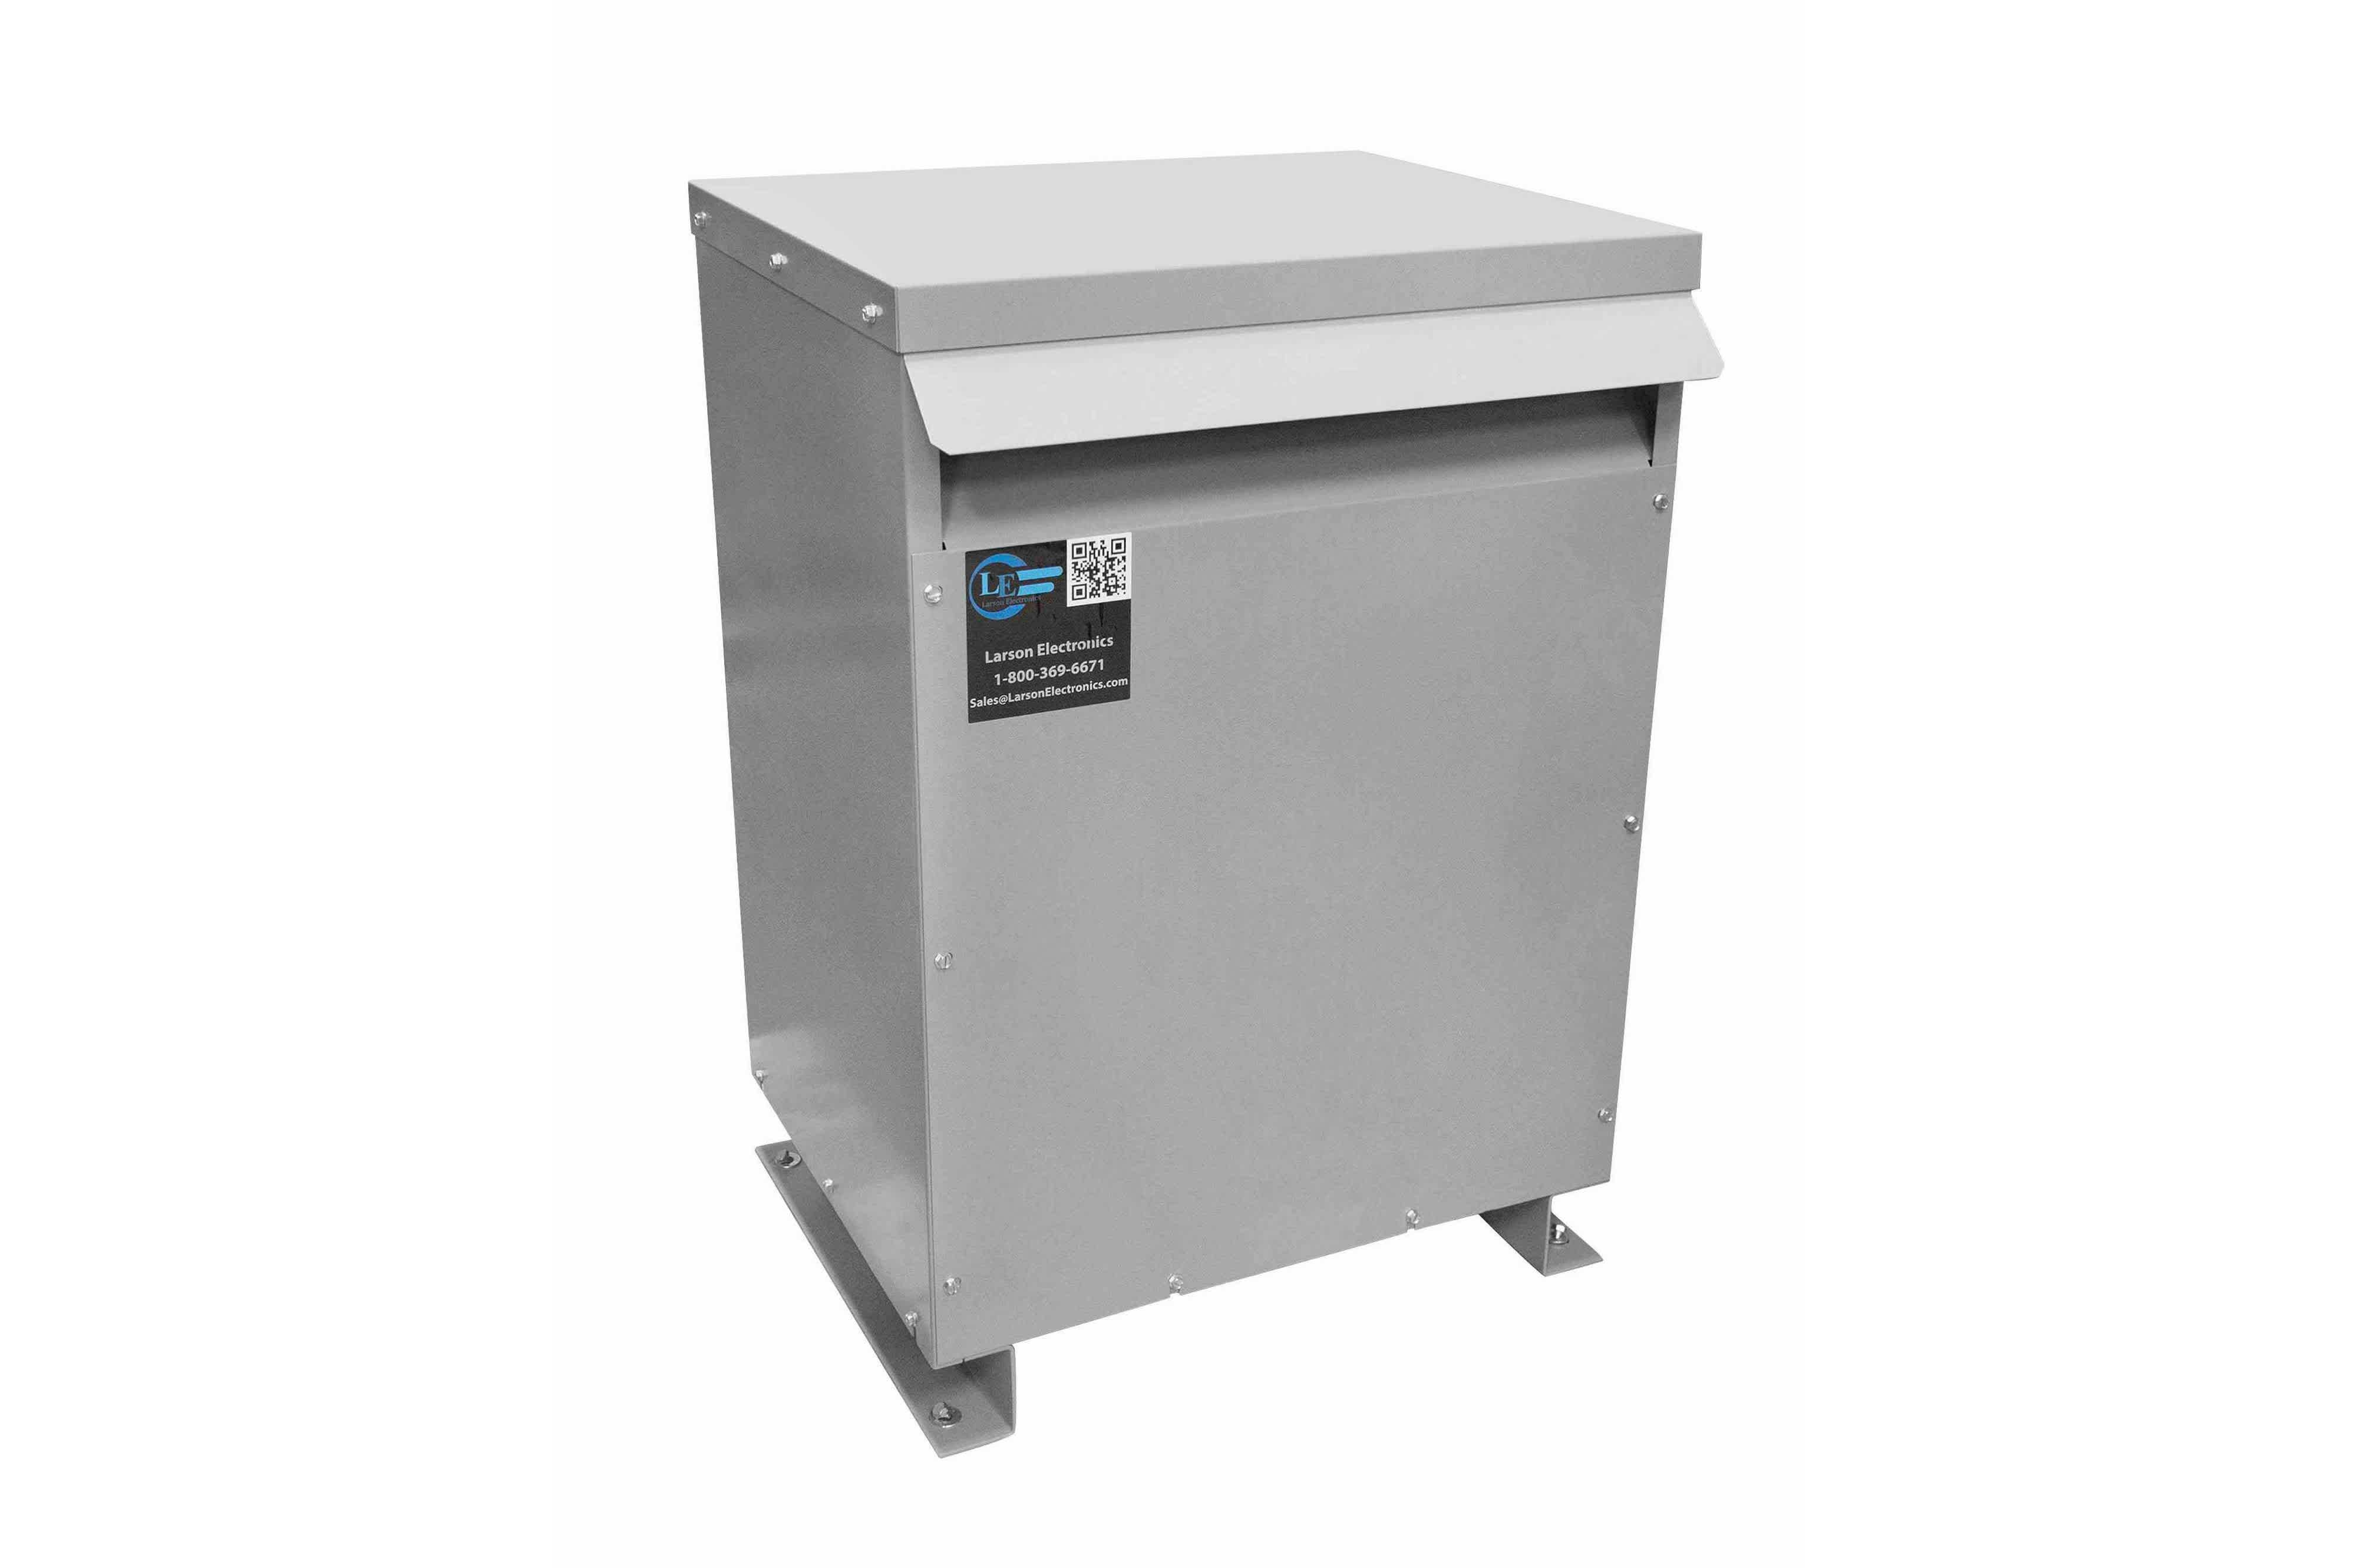 112.5 kVA 3PH Isolation Transformer, 600V Wye Primary, 460Y/266 Wye-N Secondary, N3R, Ventilated, 60 Hz